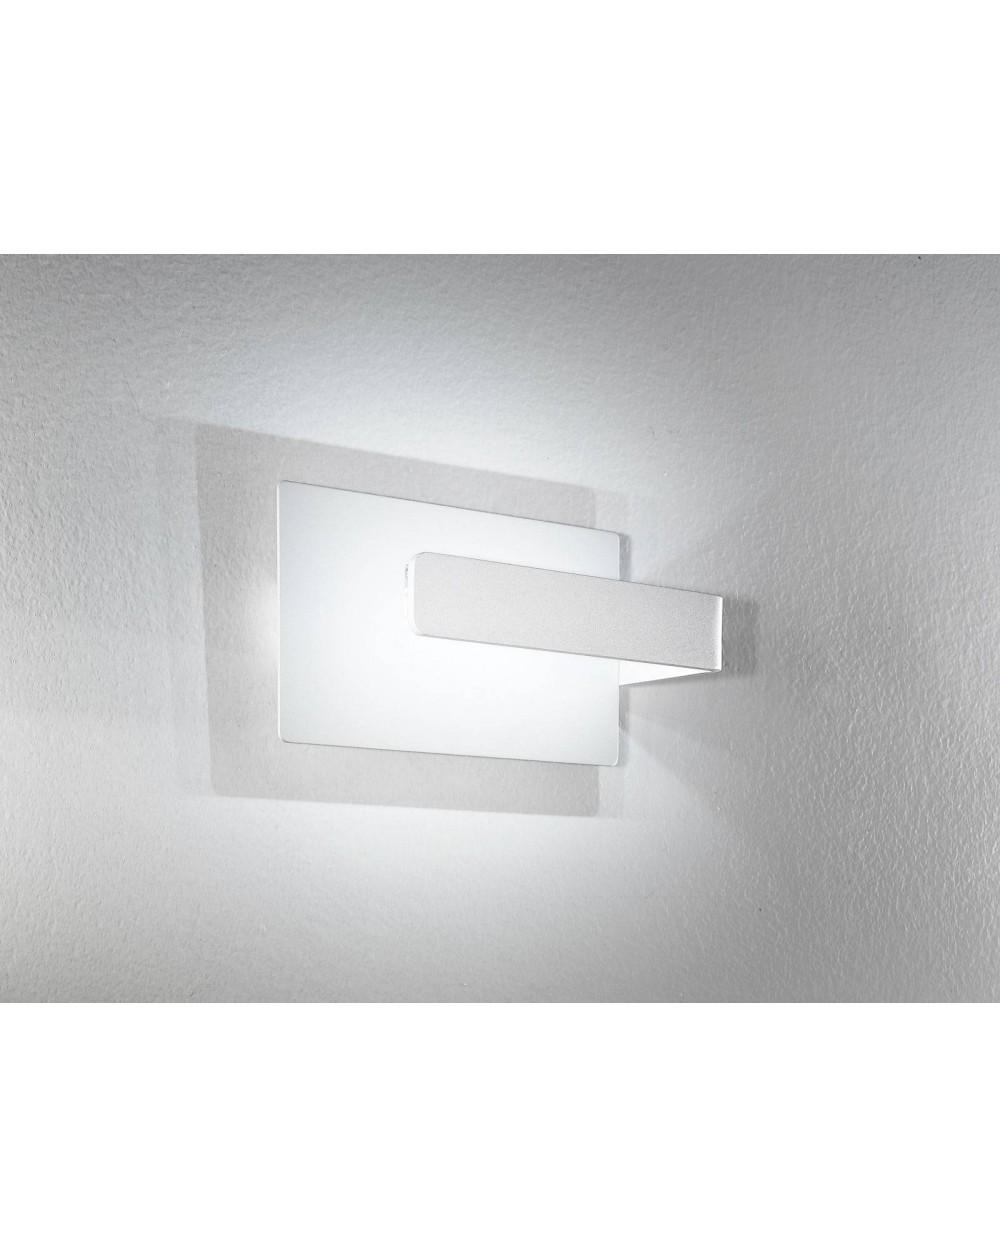 Applique lampade da parete led luce luci roma tuscolana - Applique moderne per bagno ...